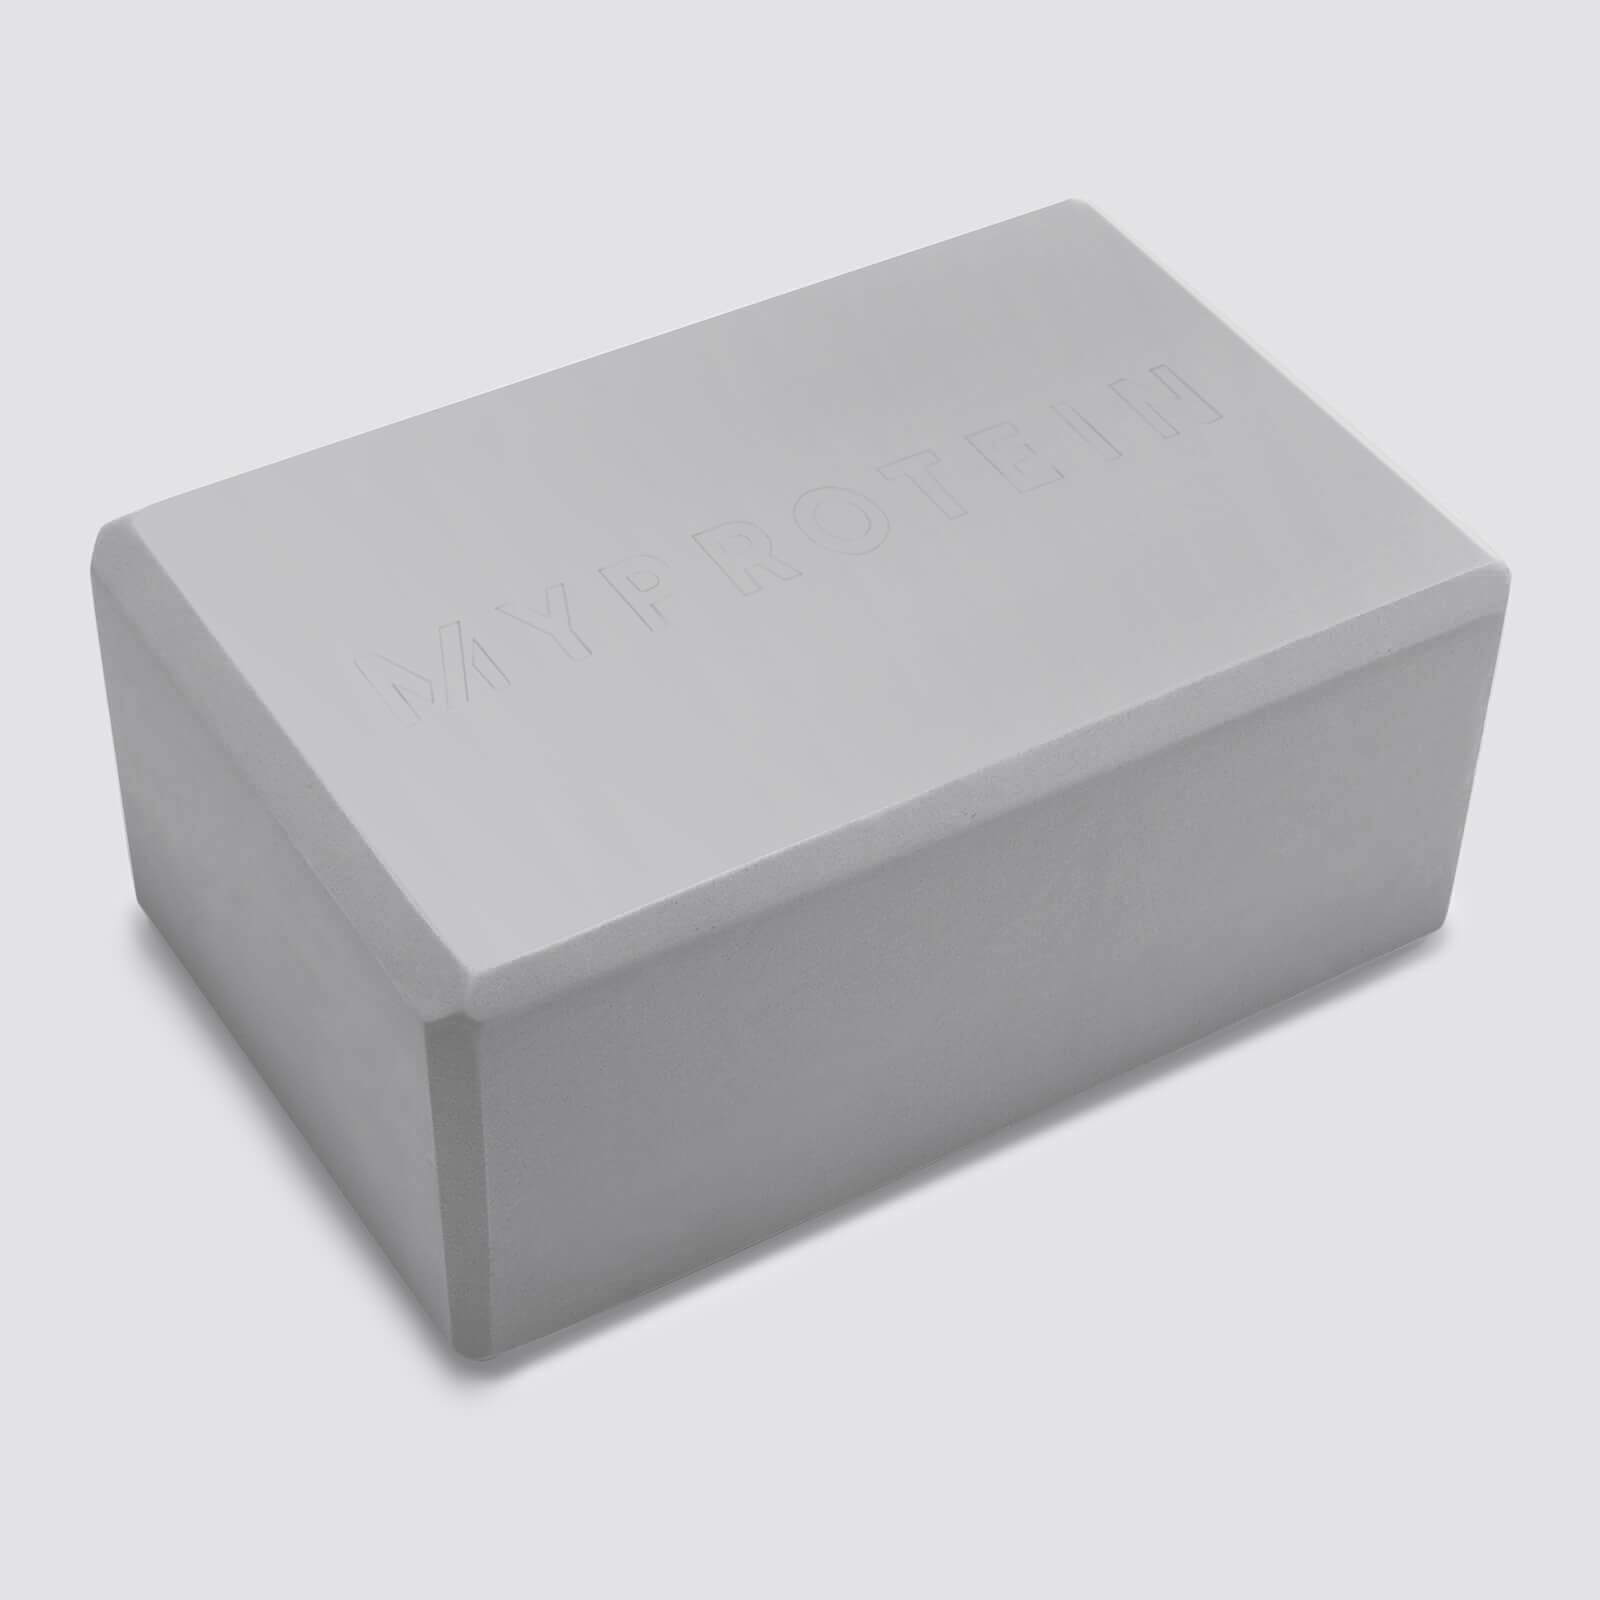 Myprotein Yoga Block - Grey